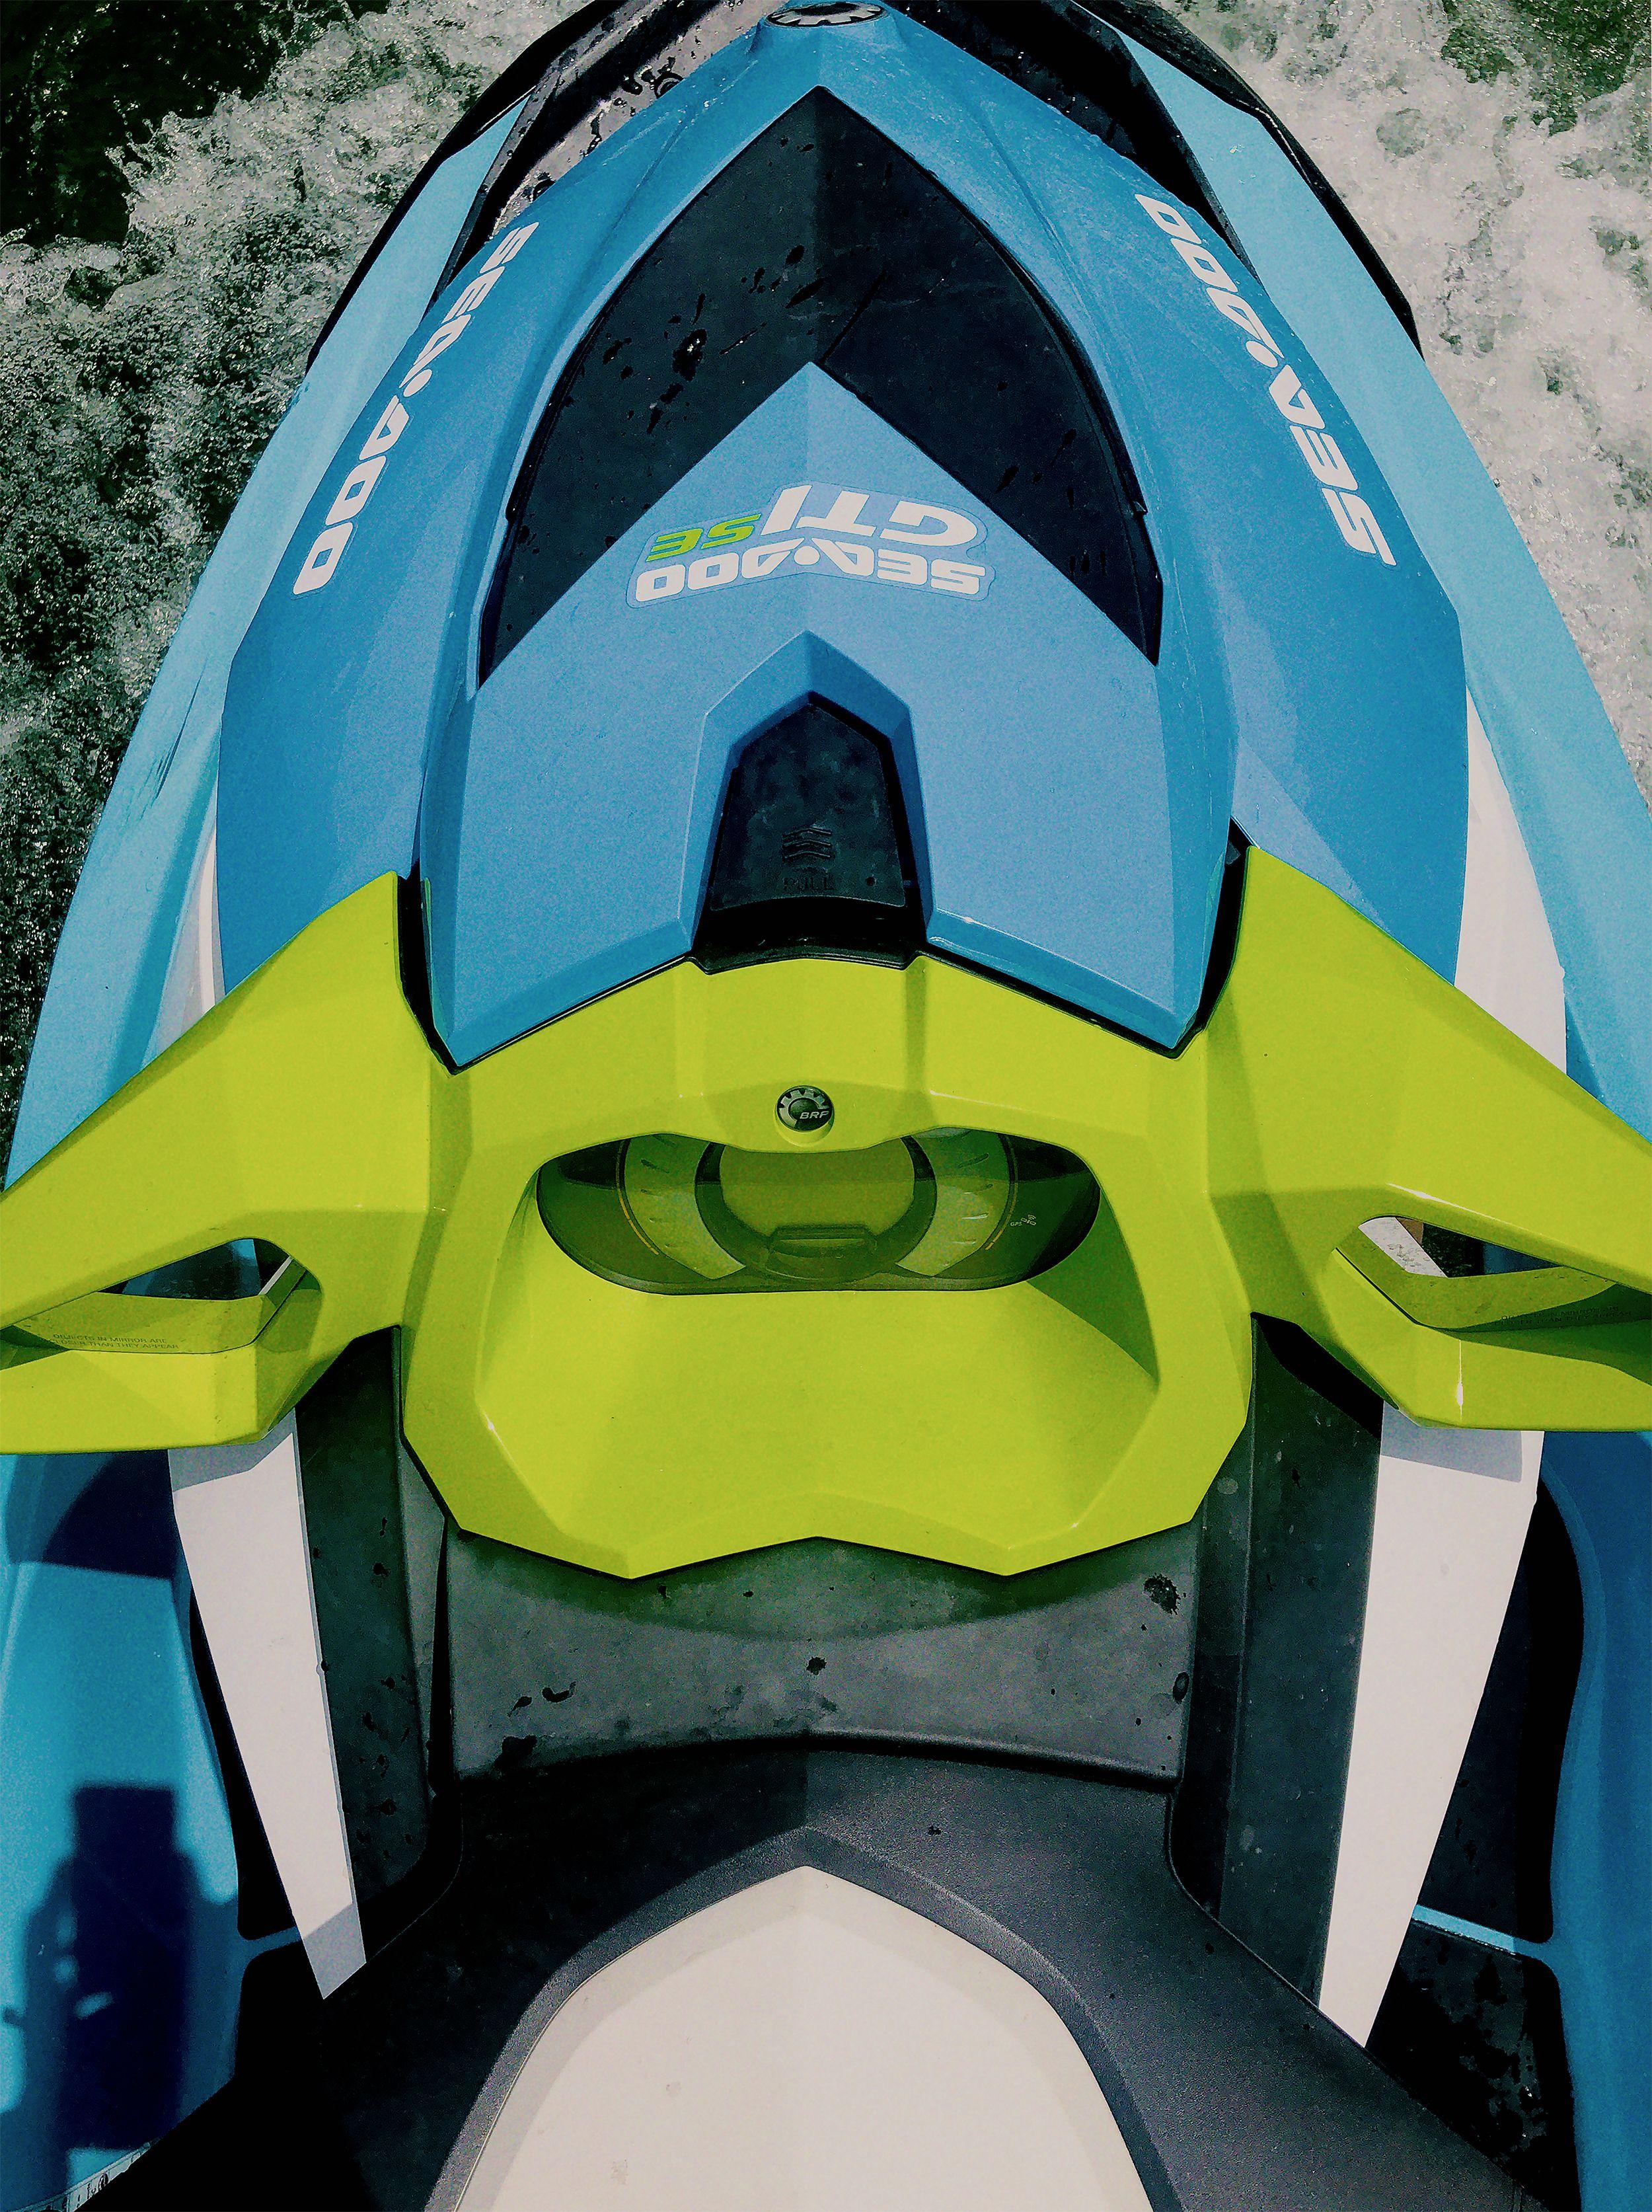 Center hill lake jet ski rentals tennessee in 2020 jet